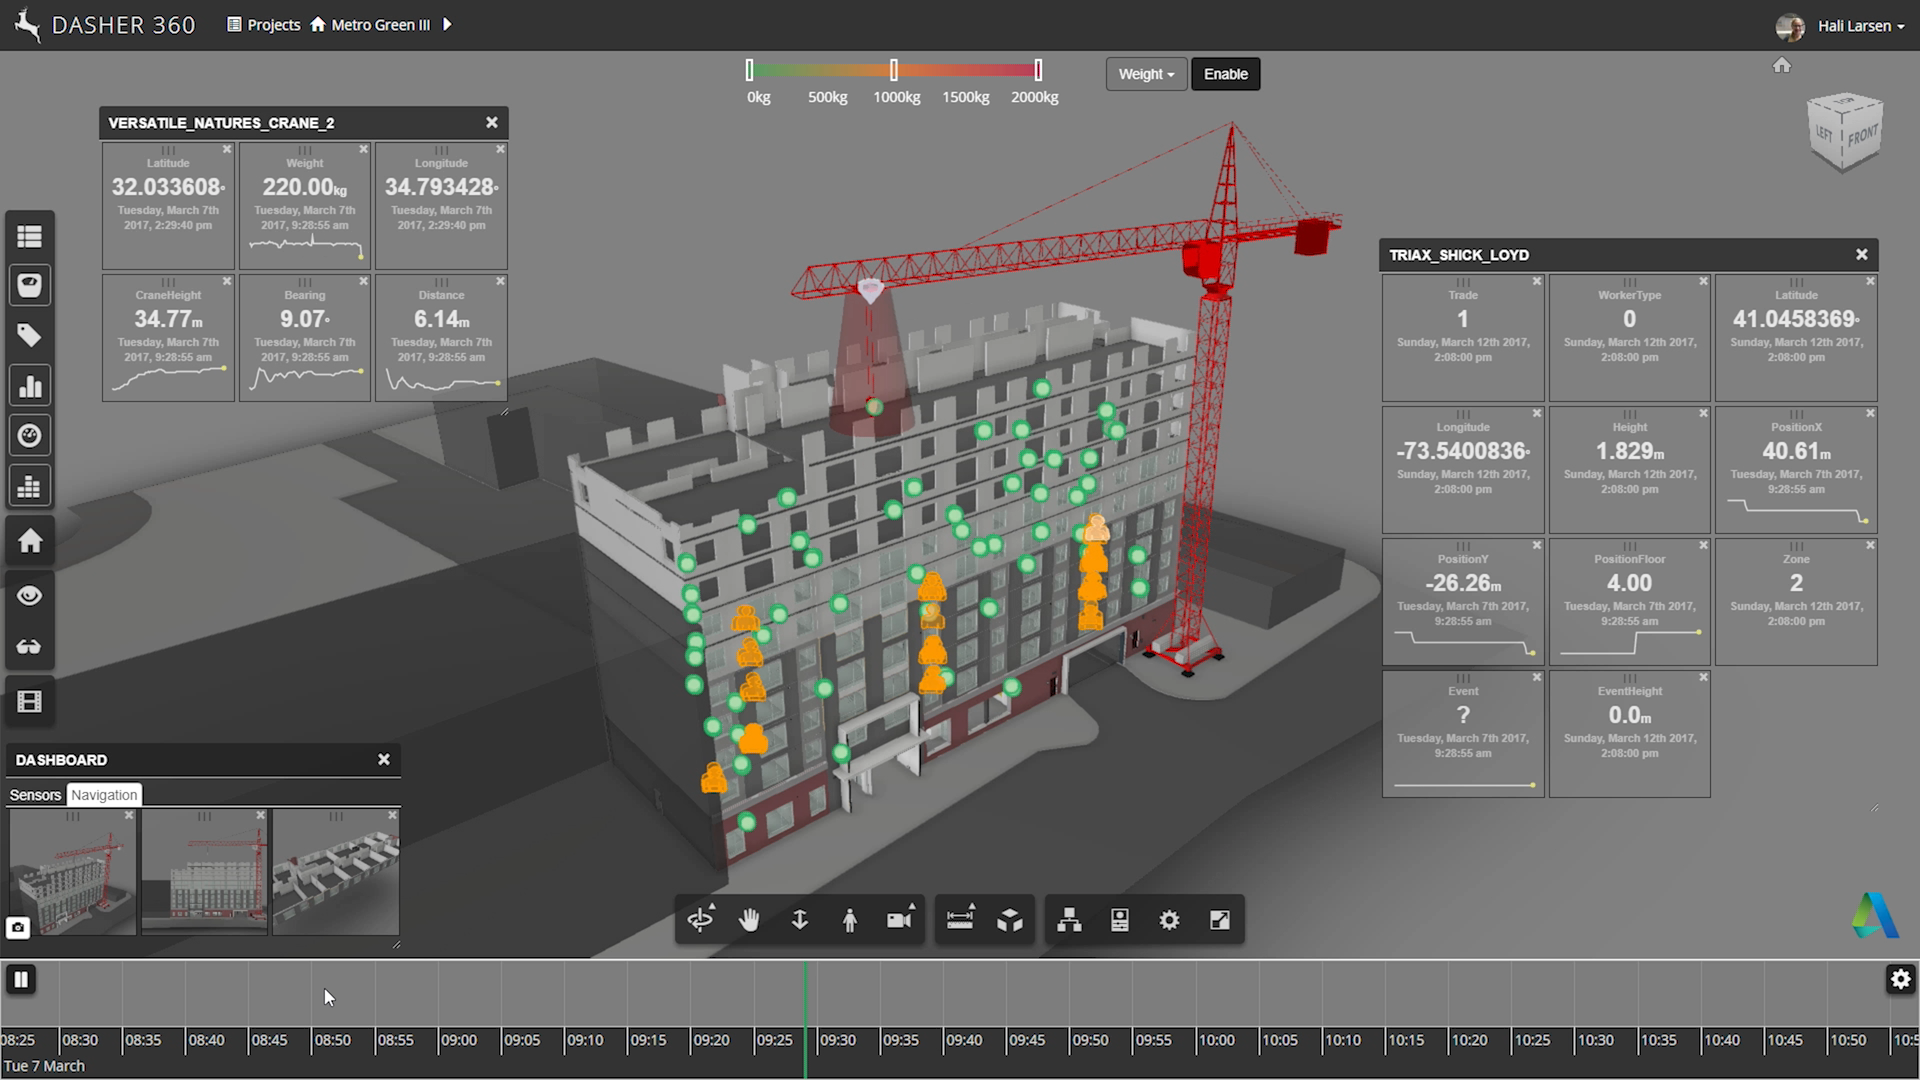 Illustration of Versatile Natures' software for construction site visualization